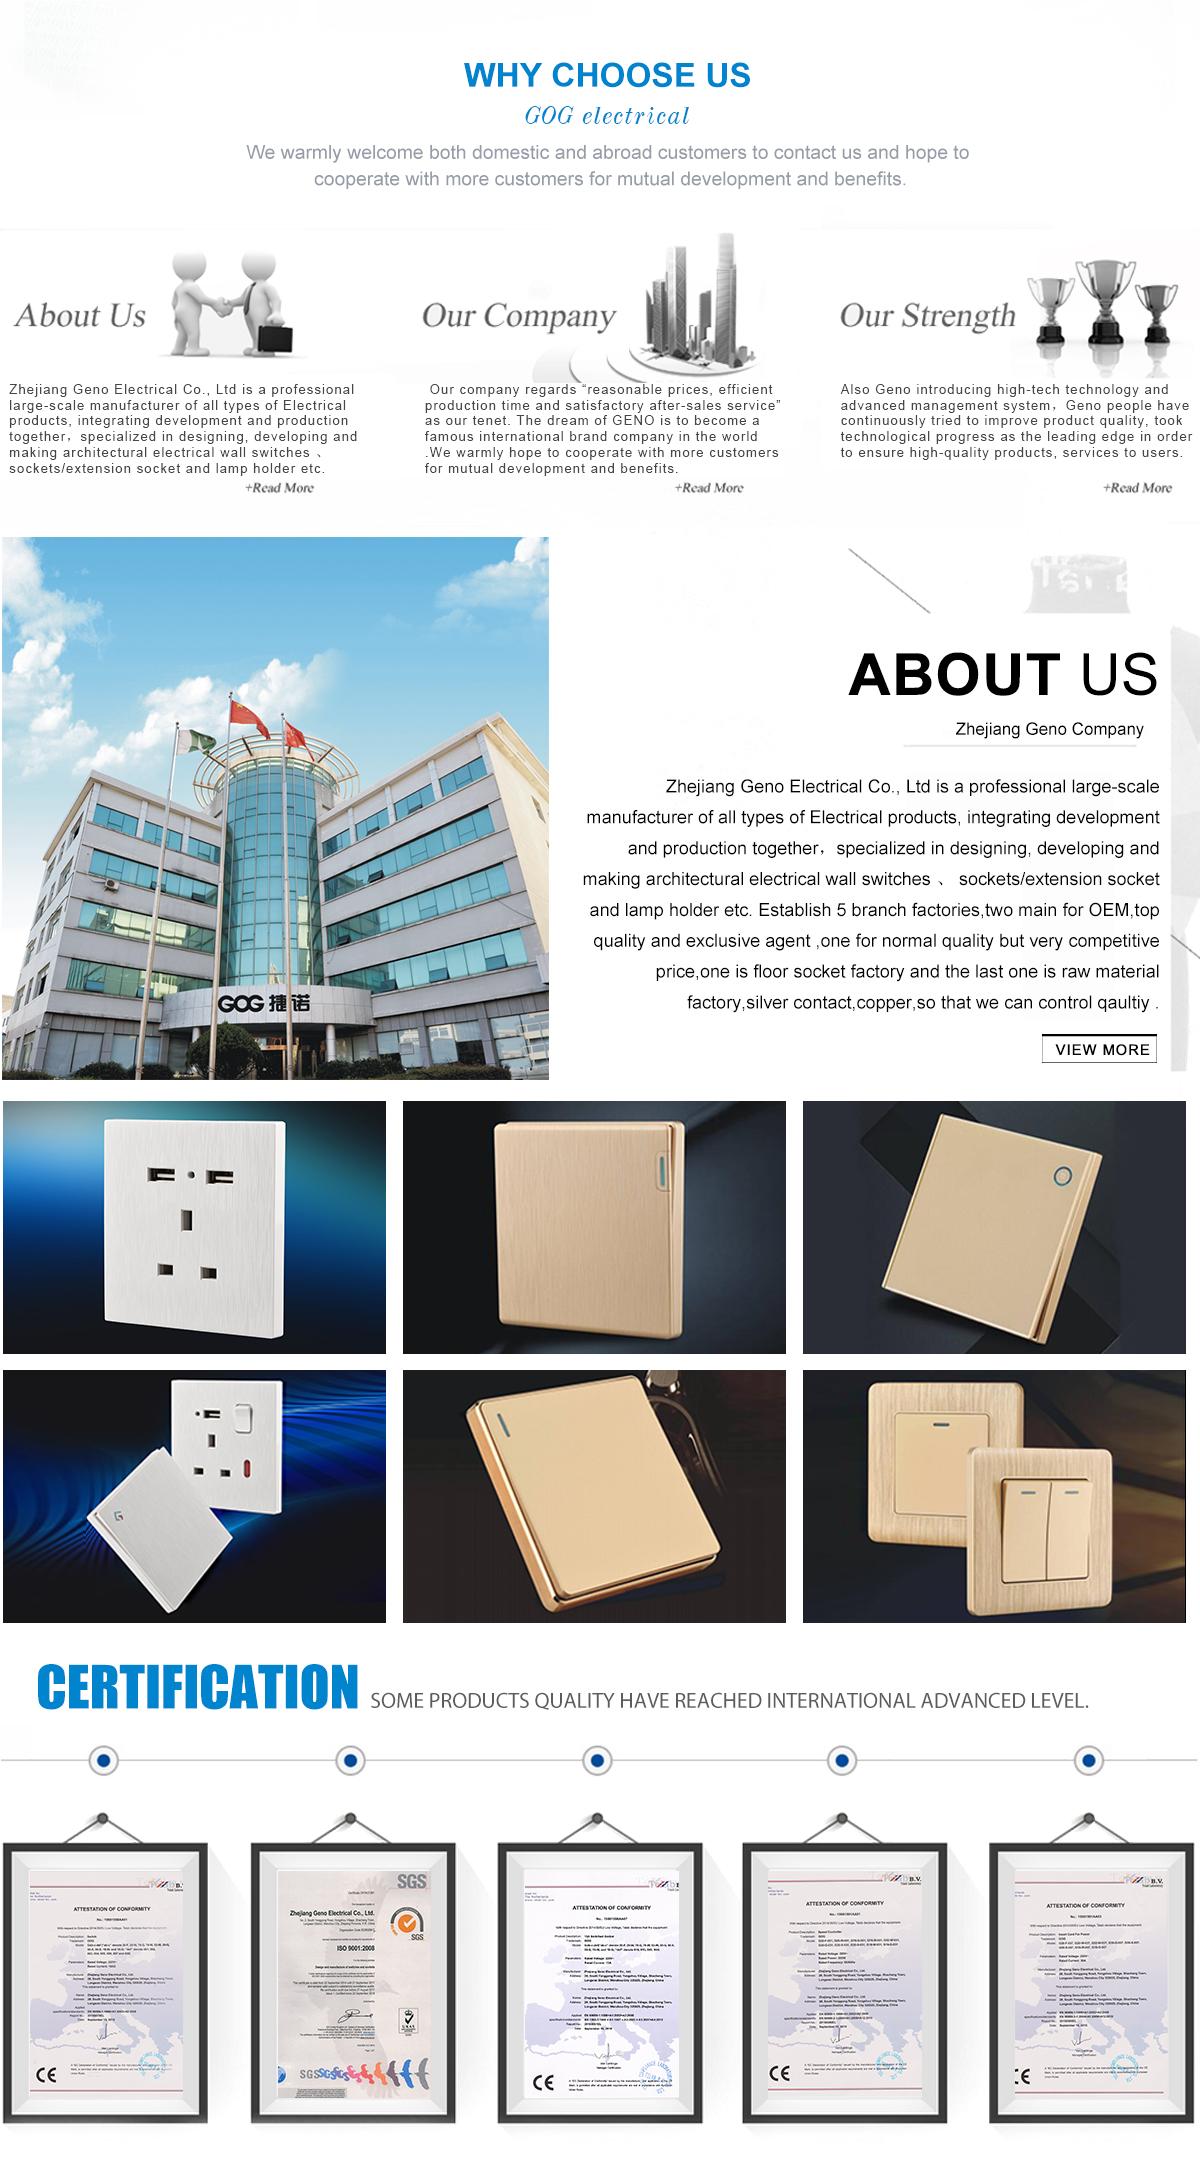 Zhejiang Geno Electrical Co., Ltd. - Switches, Sockets